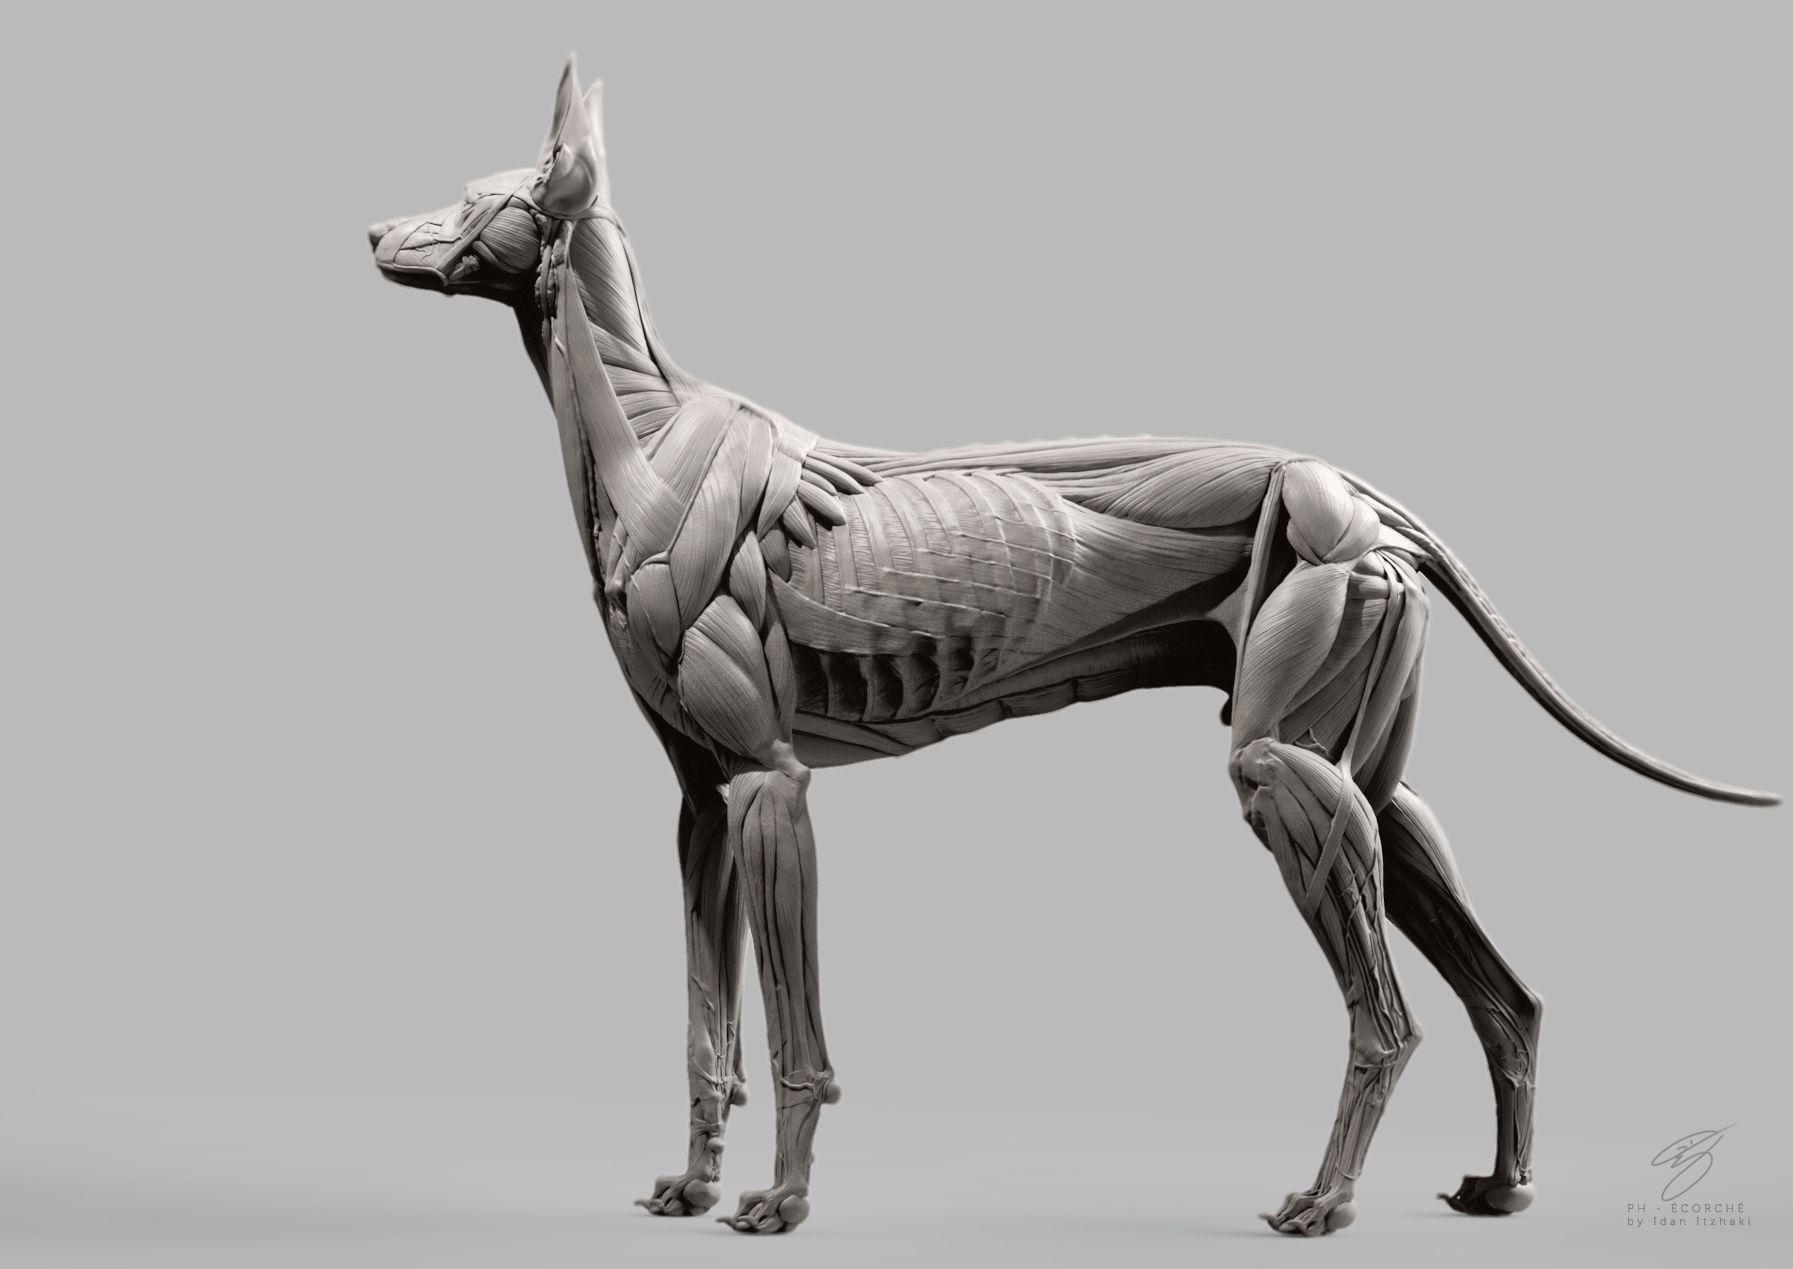 Sketchbook - Anatomy and Stuff | Dog Anatomy | Pinterest | Anatomy ...